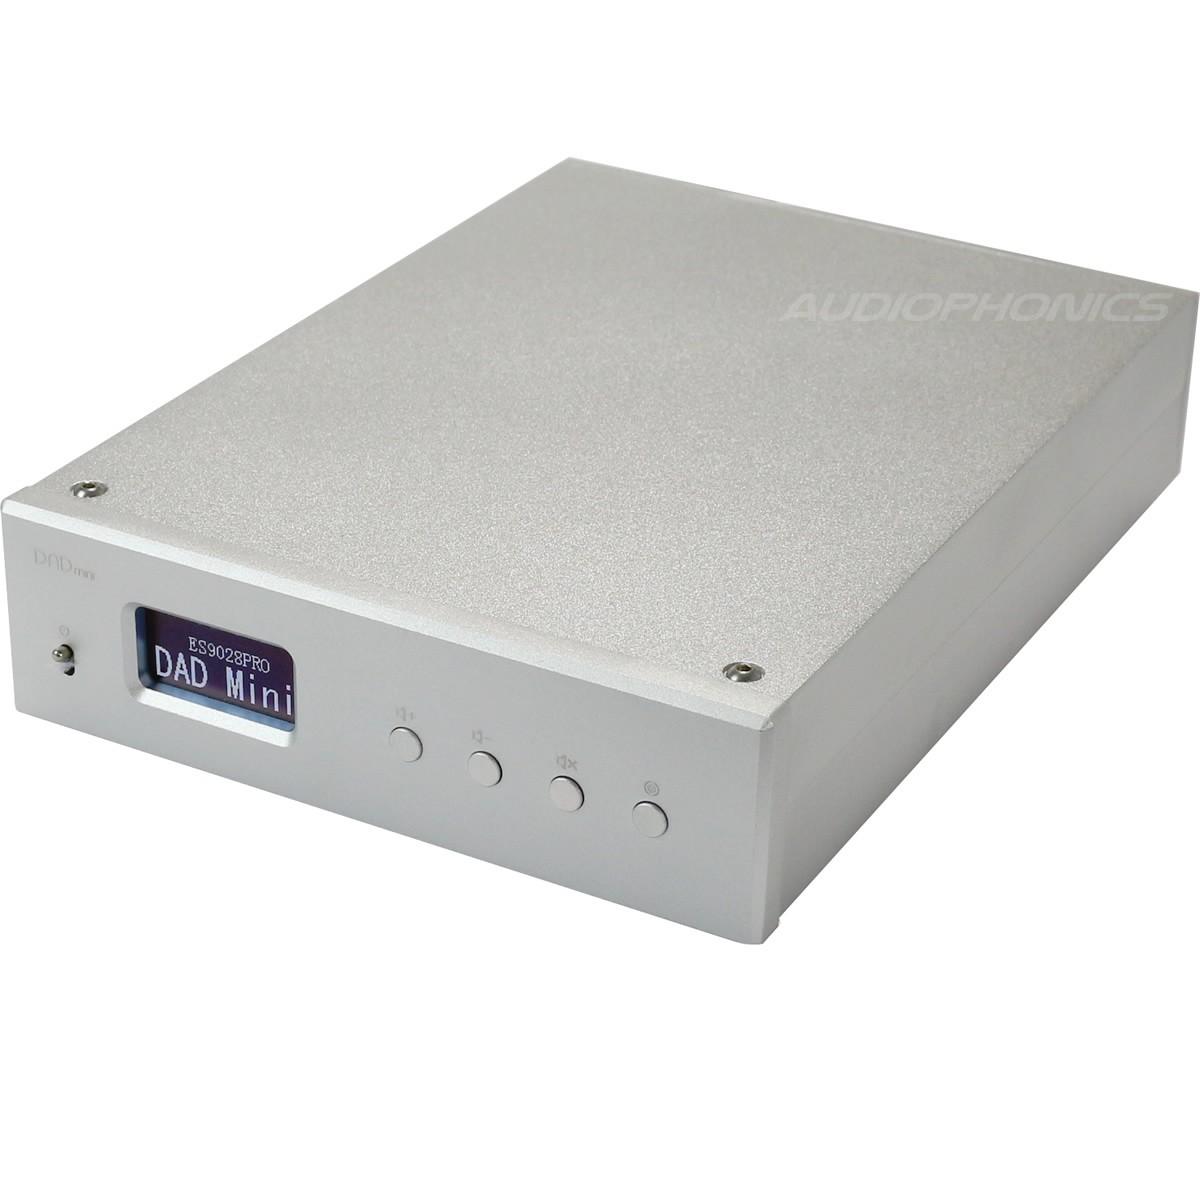 JA DAD MINI DAC USB ES9028 PRO symétrique XLR 32bit / 384kHz DSD 256 XMOS